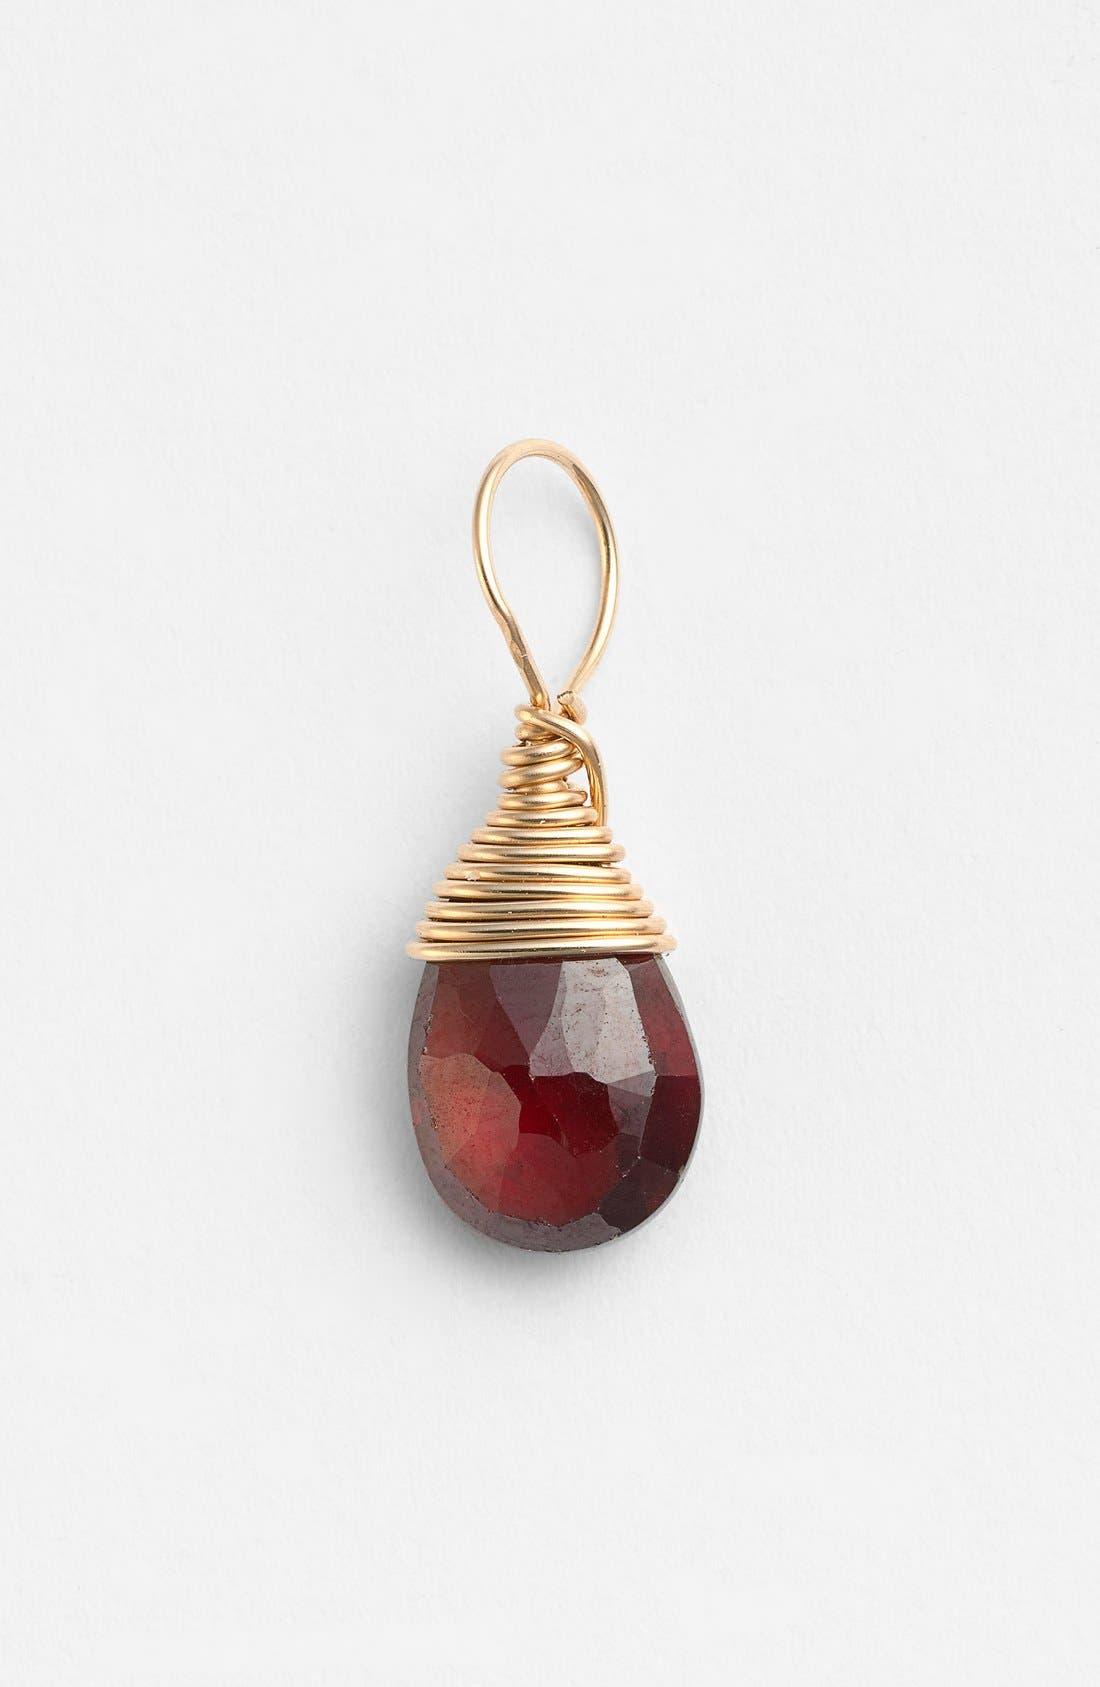 14k-Gold Fill & Semiprecious Stone Charm,                         Main,                         color, GARNET